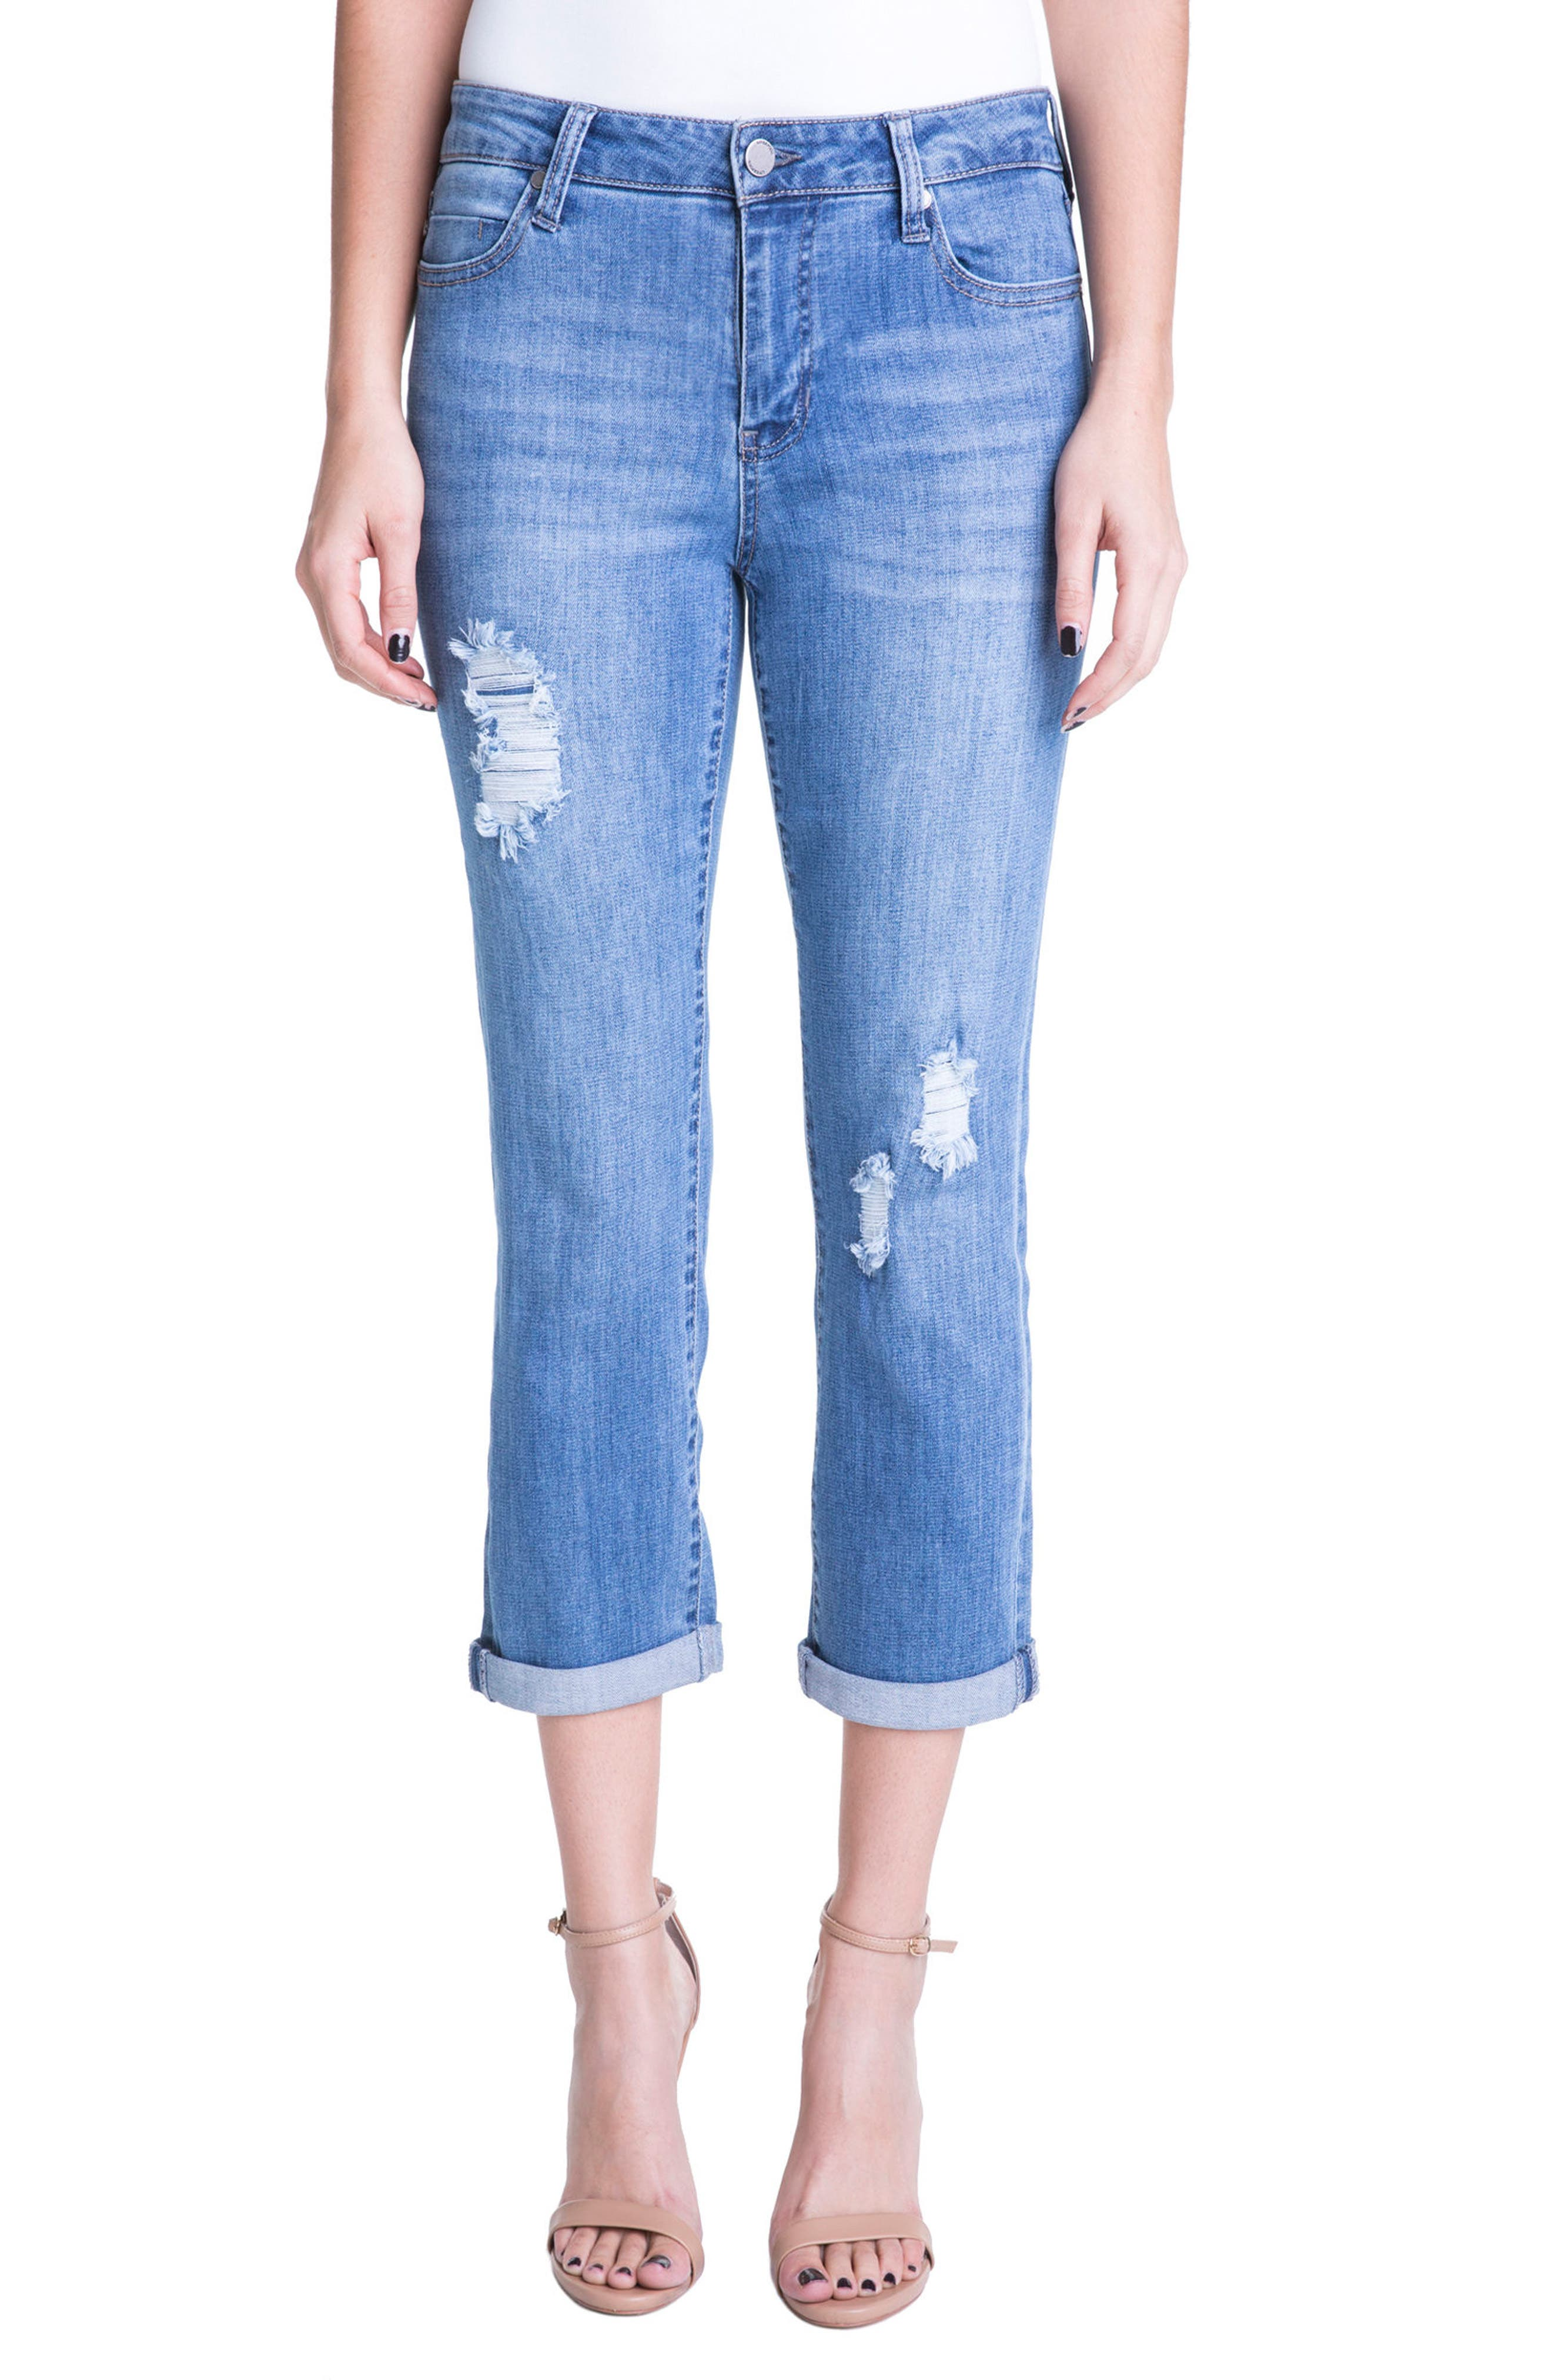 Main Image - Liverpool Jeans Company Michelle Distressed Cuff Capri Jeans (Melbourne Light Destruction)